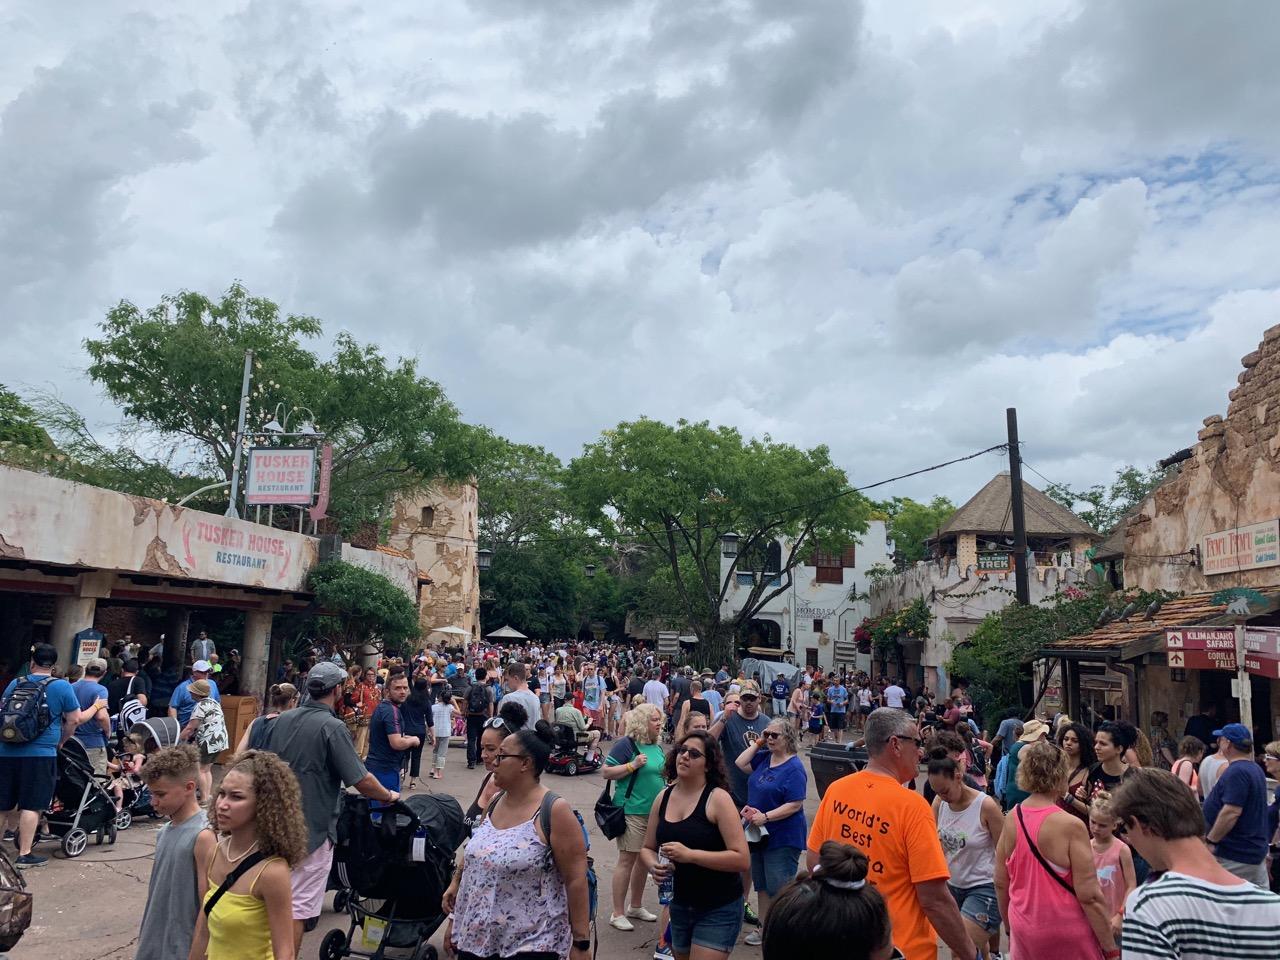 disney world trip report early summer 2019 day three 90 crowds.jpeg